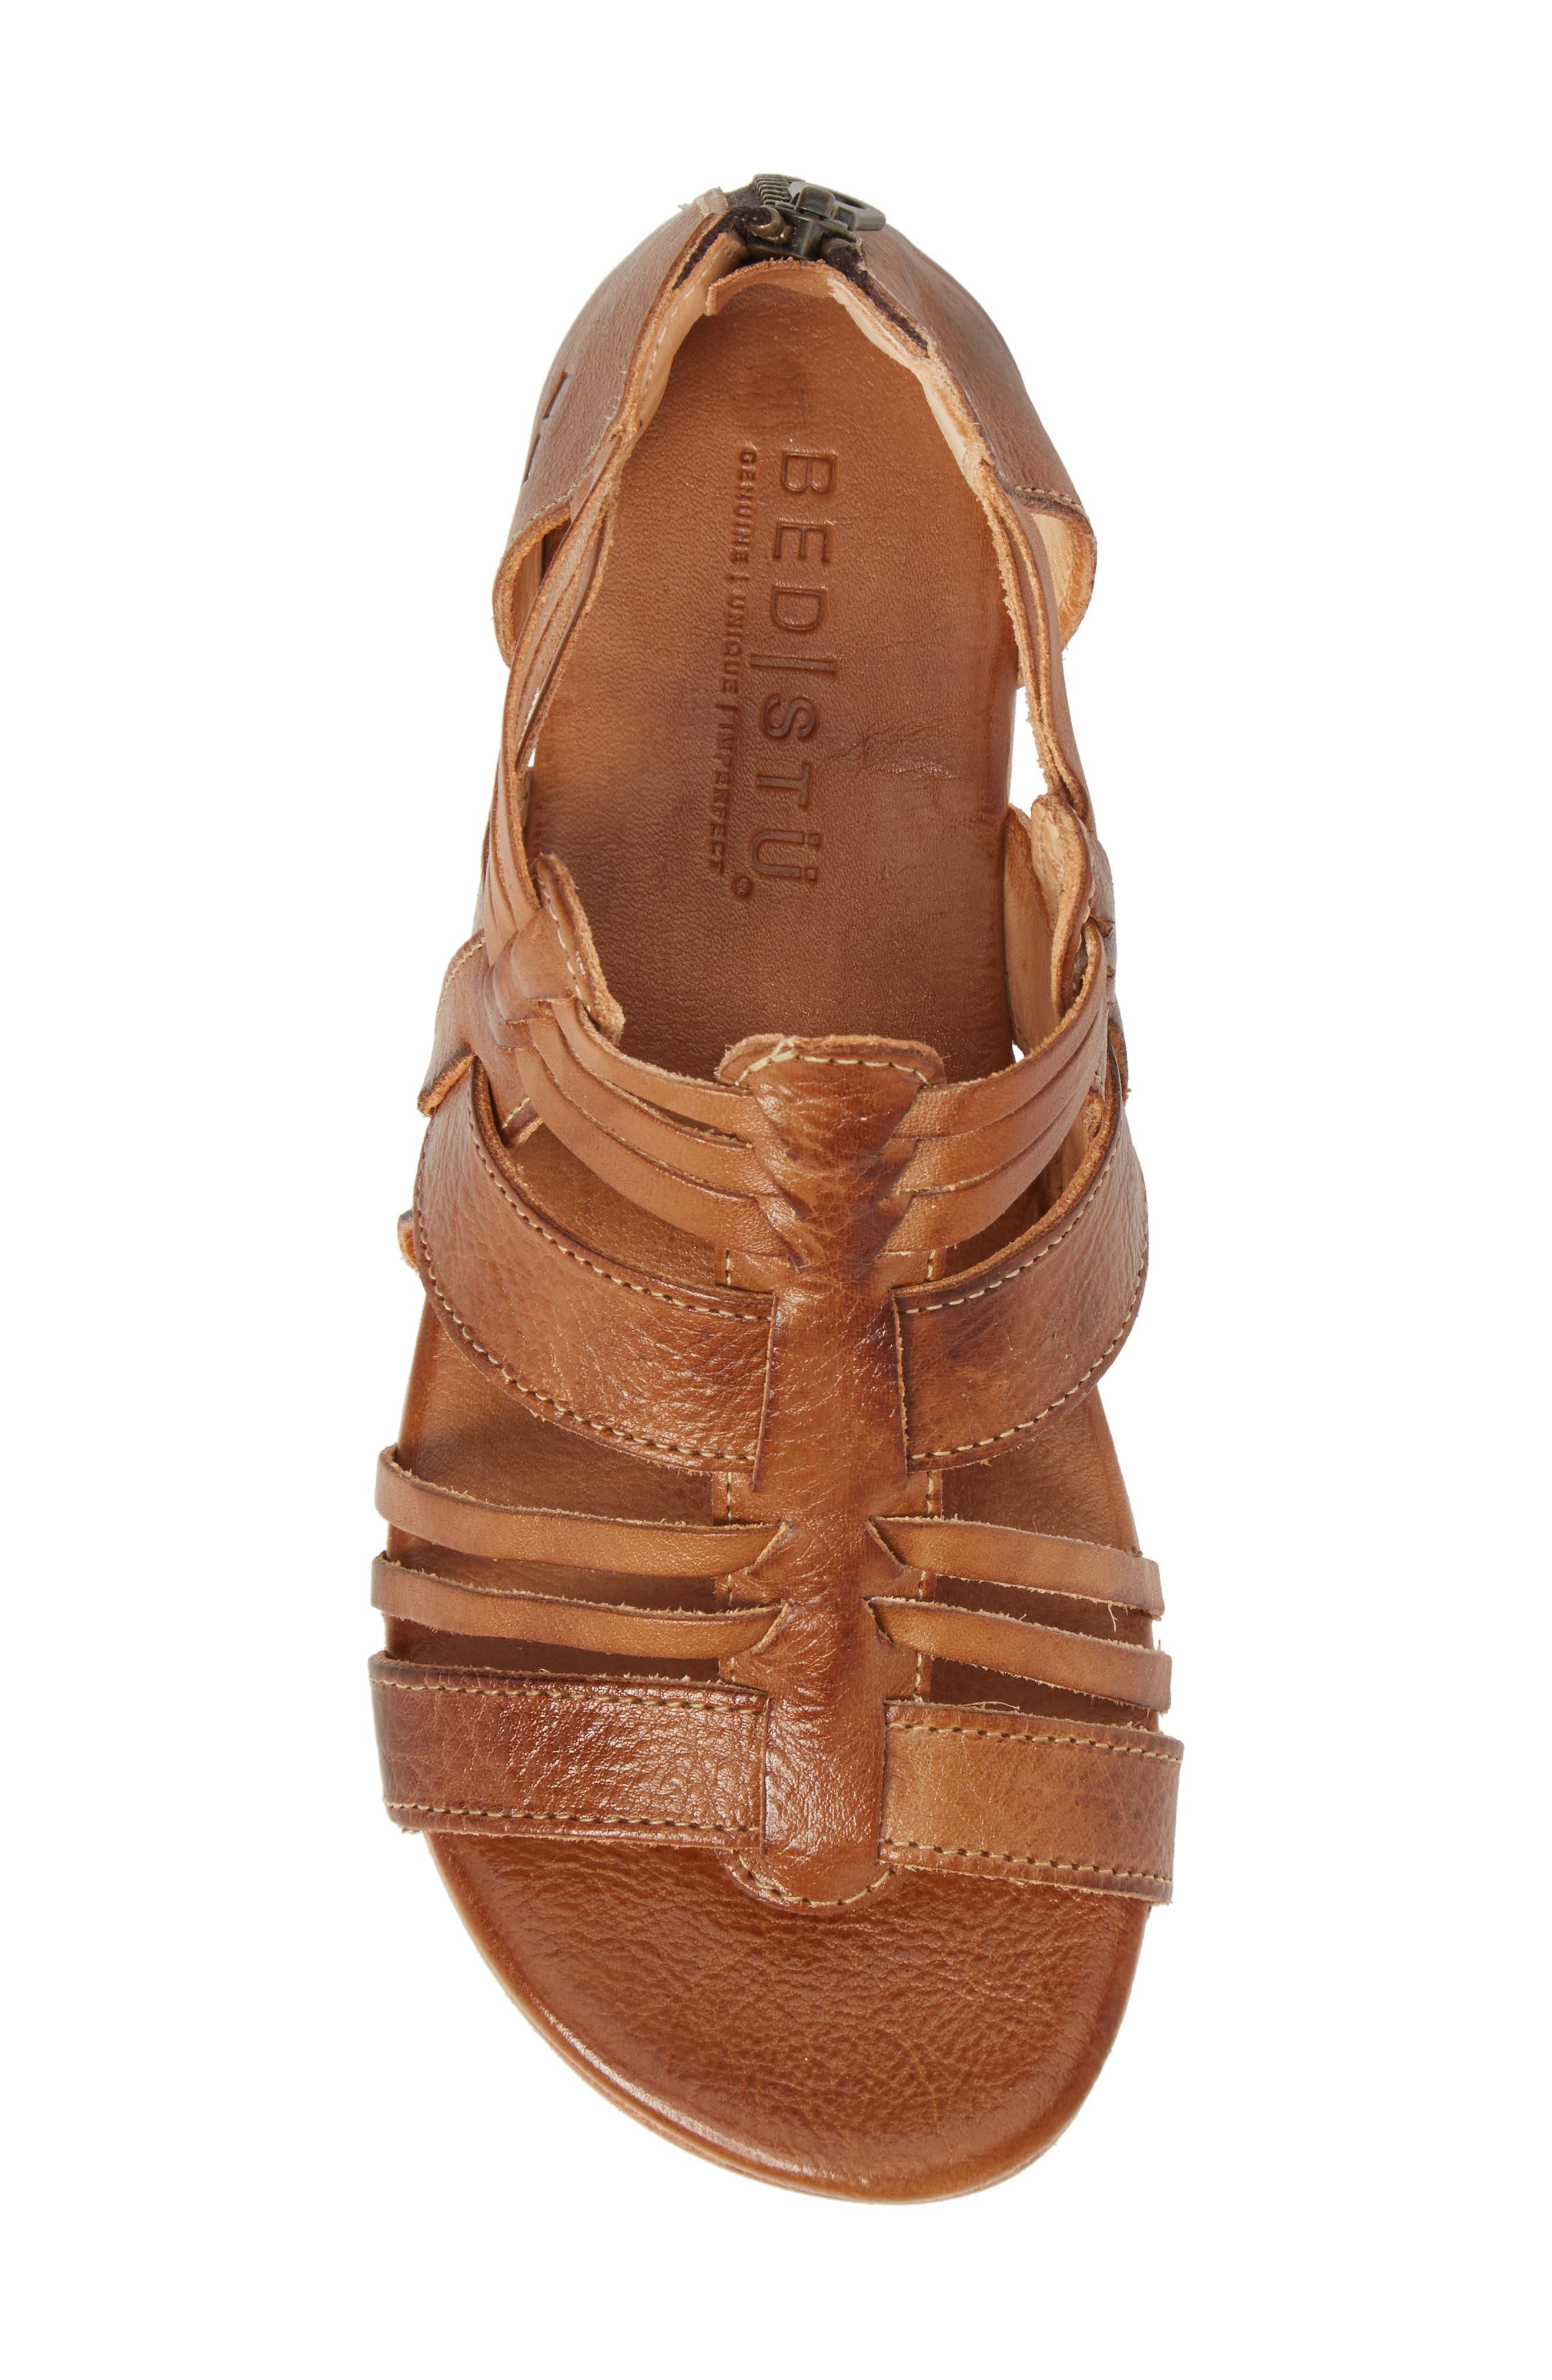 Cara Sandal,                             Alternate thumbnail 5, color,                             Tan Leather